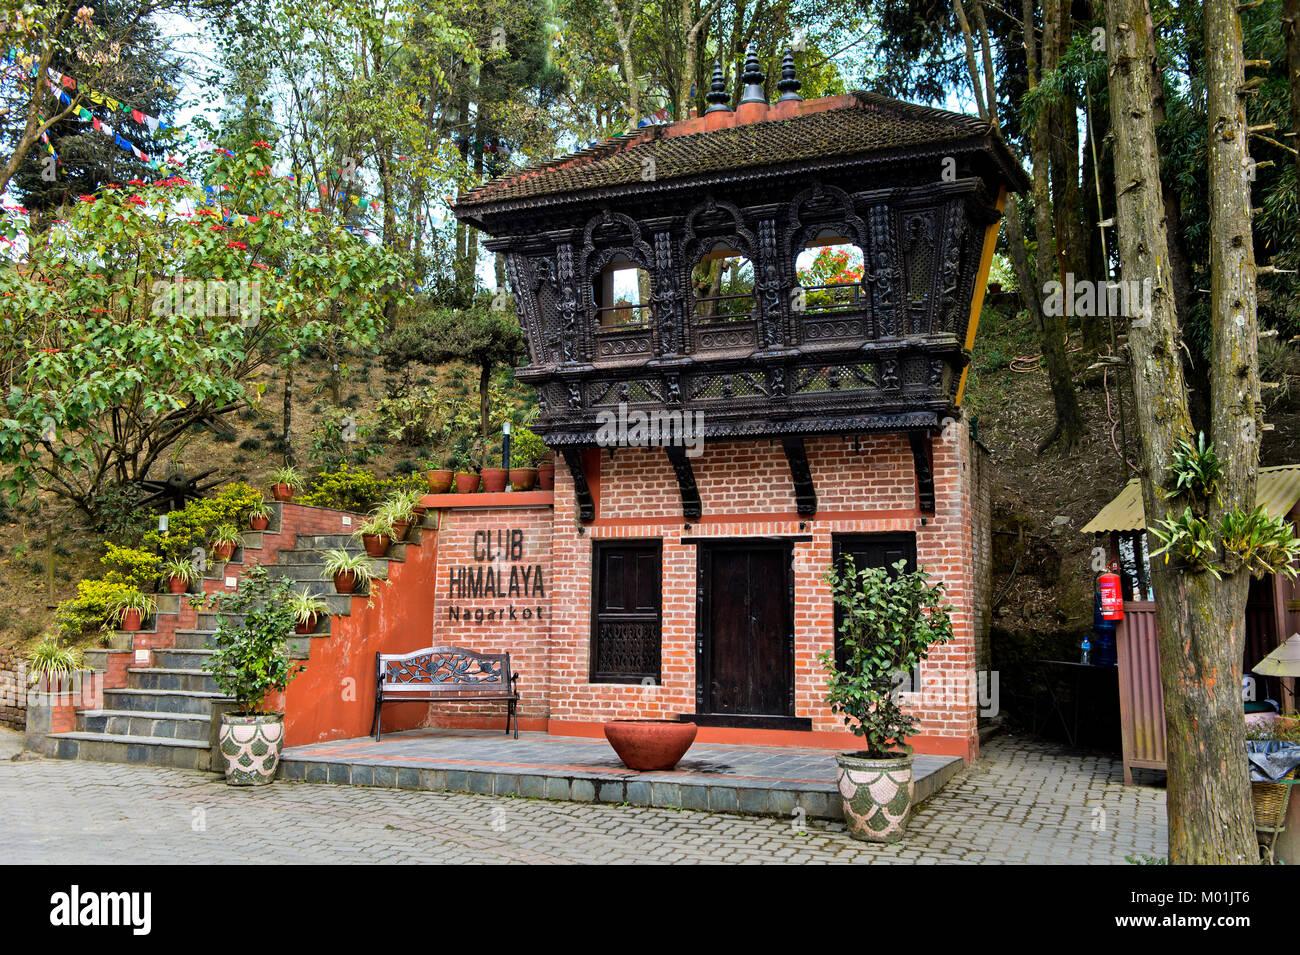 Entrance to the Club Himalaya Hotel, Nagarkot, Kathmandu, Nepal - Stock Image